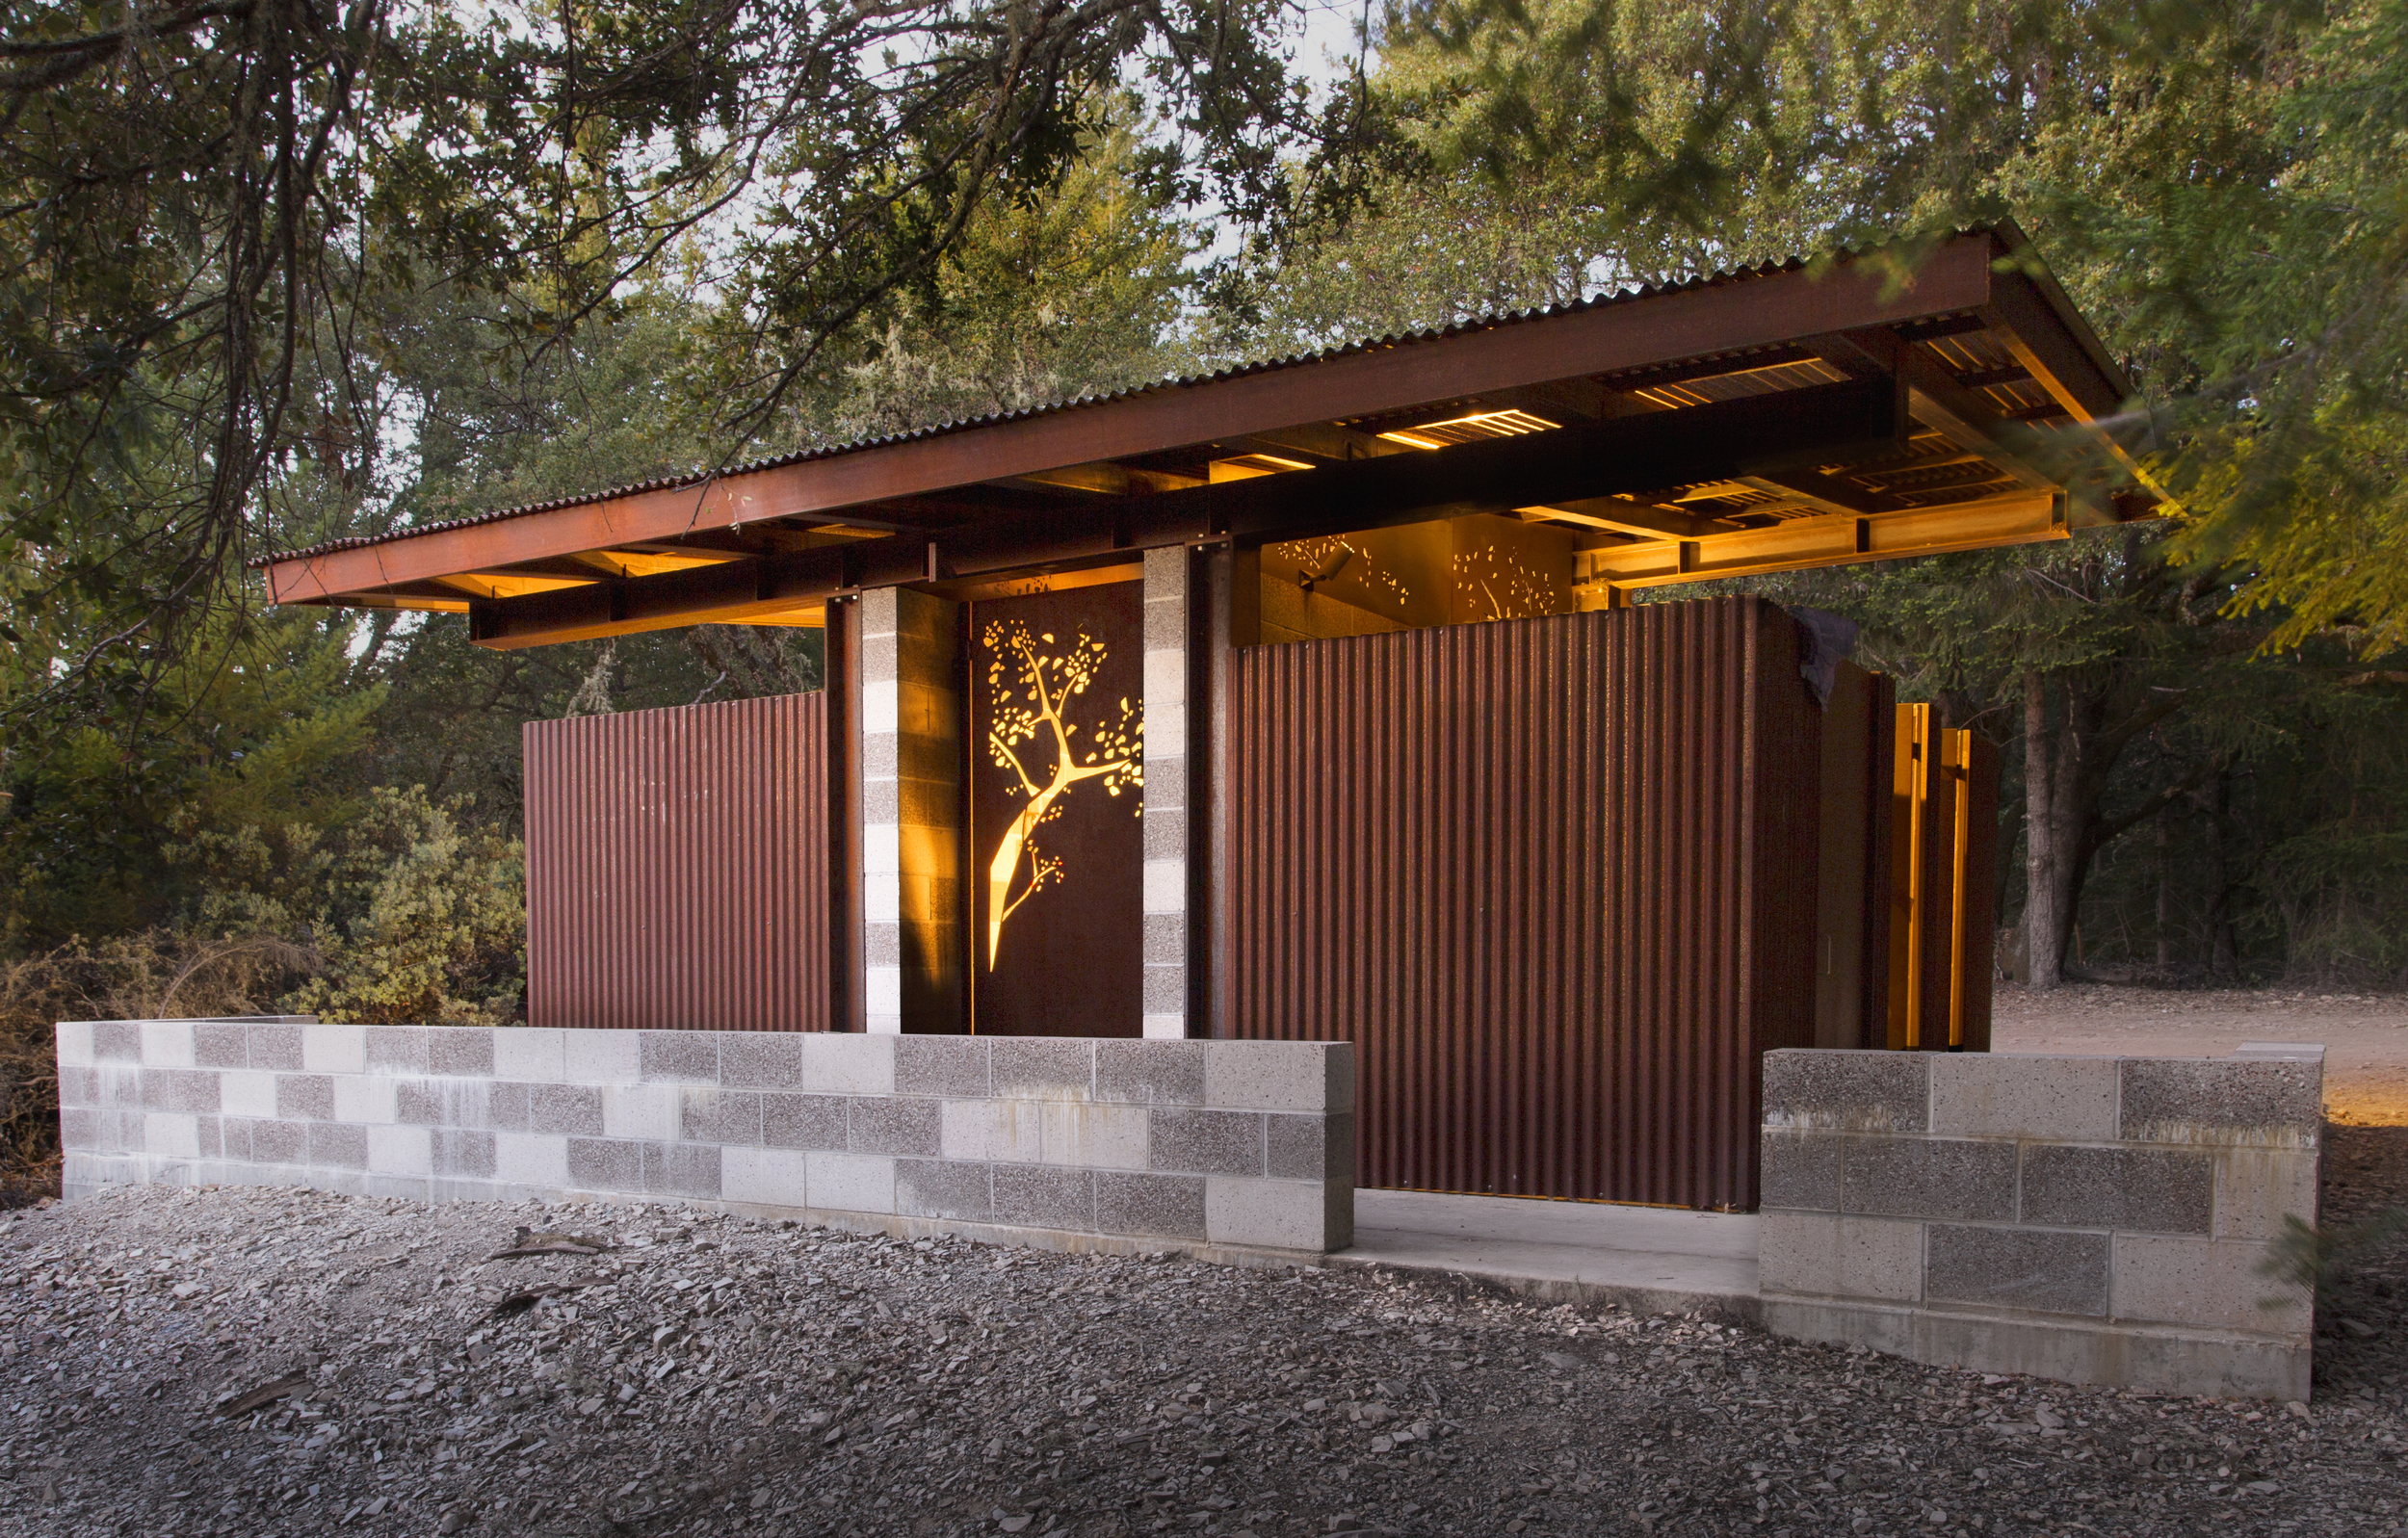 Lehi Summer Camp Bathrooms - Santa Cruz Mountains - Santa Cruz, CA